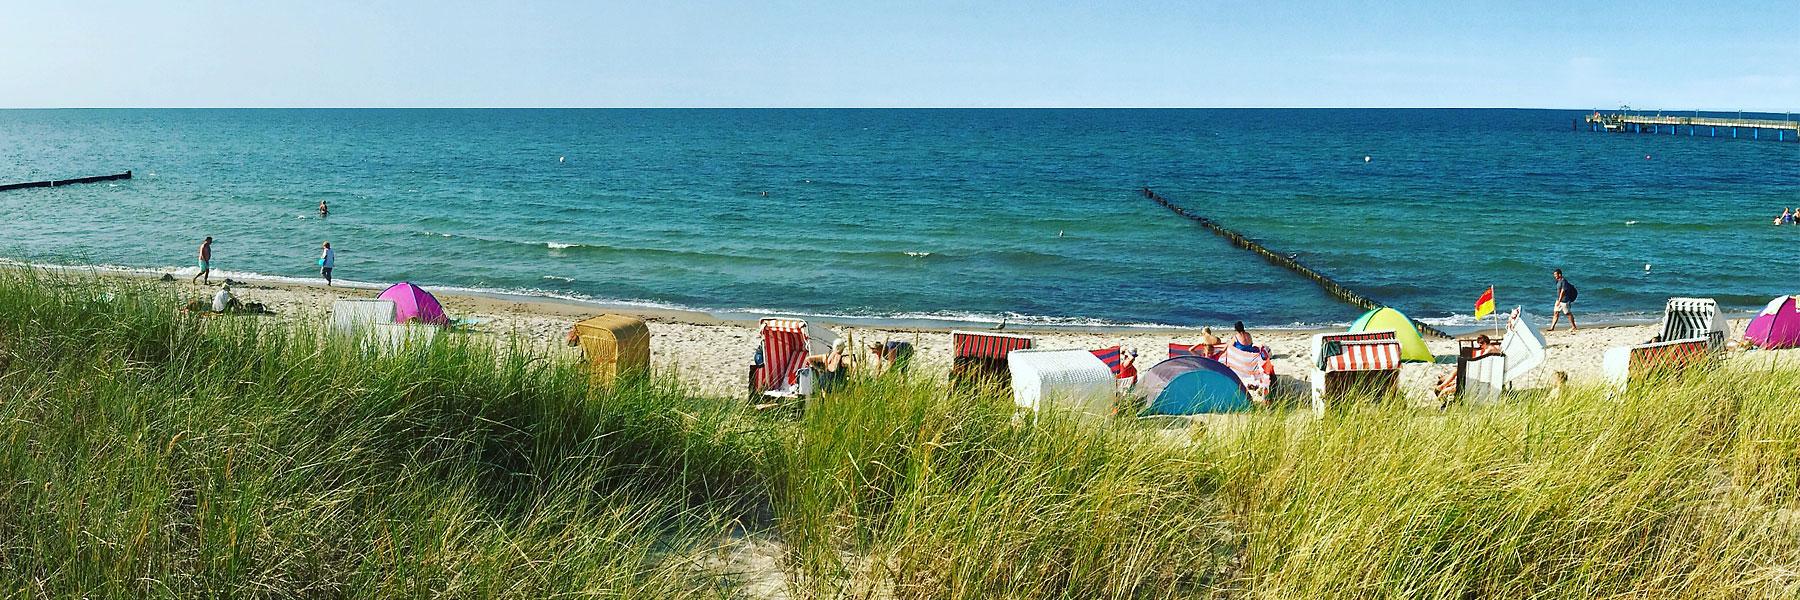 Strand Seebrücke - Graal-Müritz